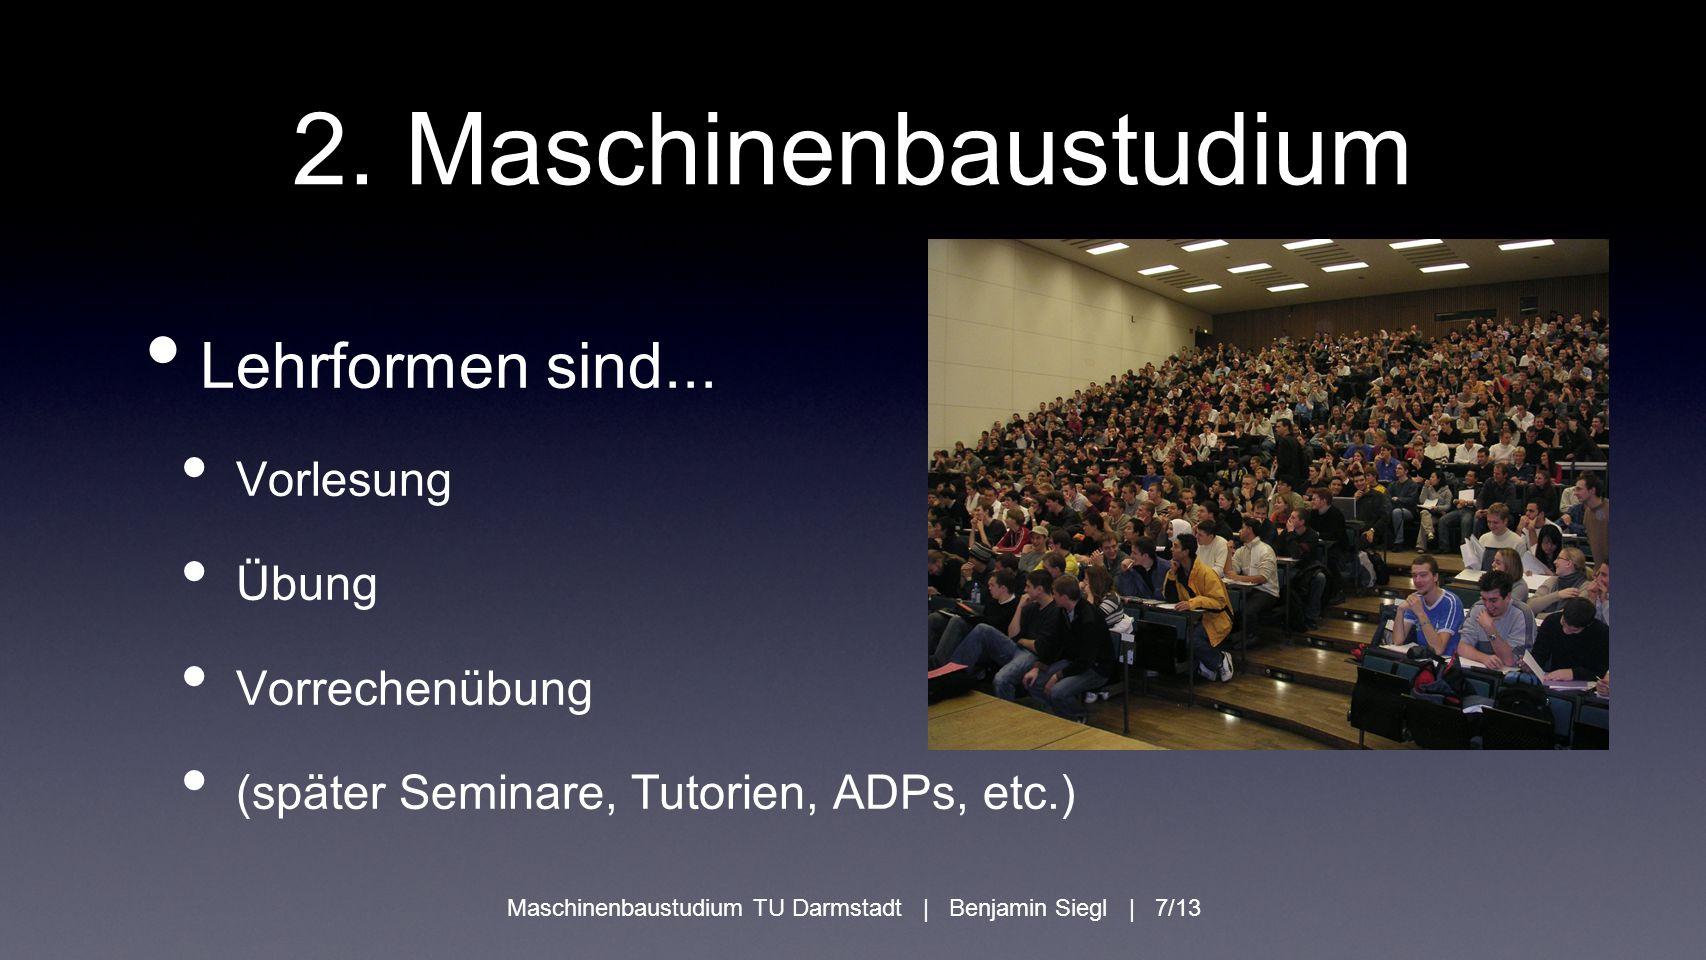 Maschinenbaustudium TU Darmstadt | Benjamin Siegl | 7/13